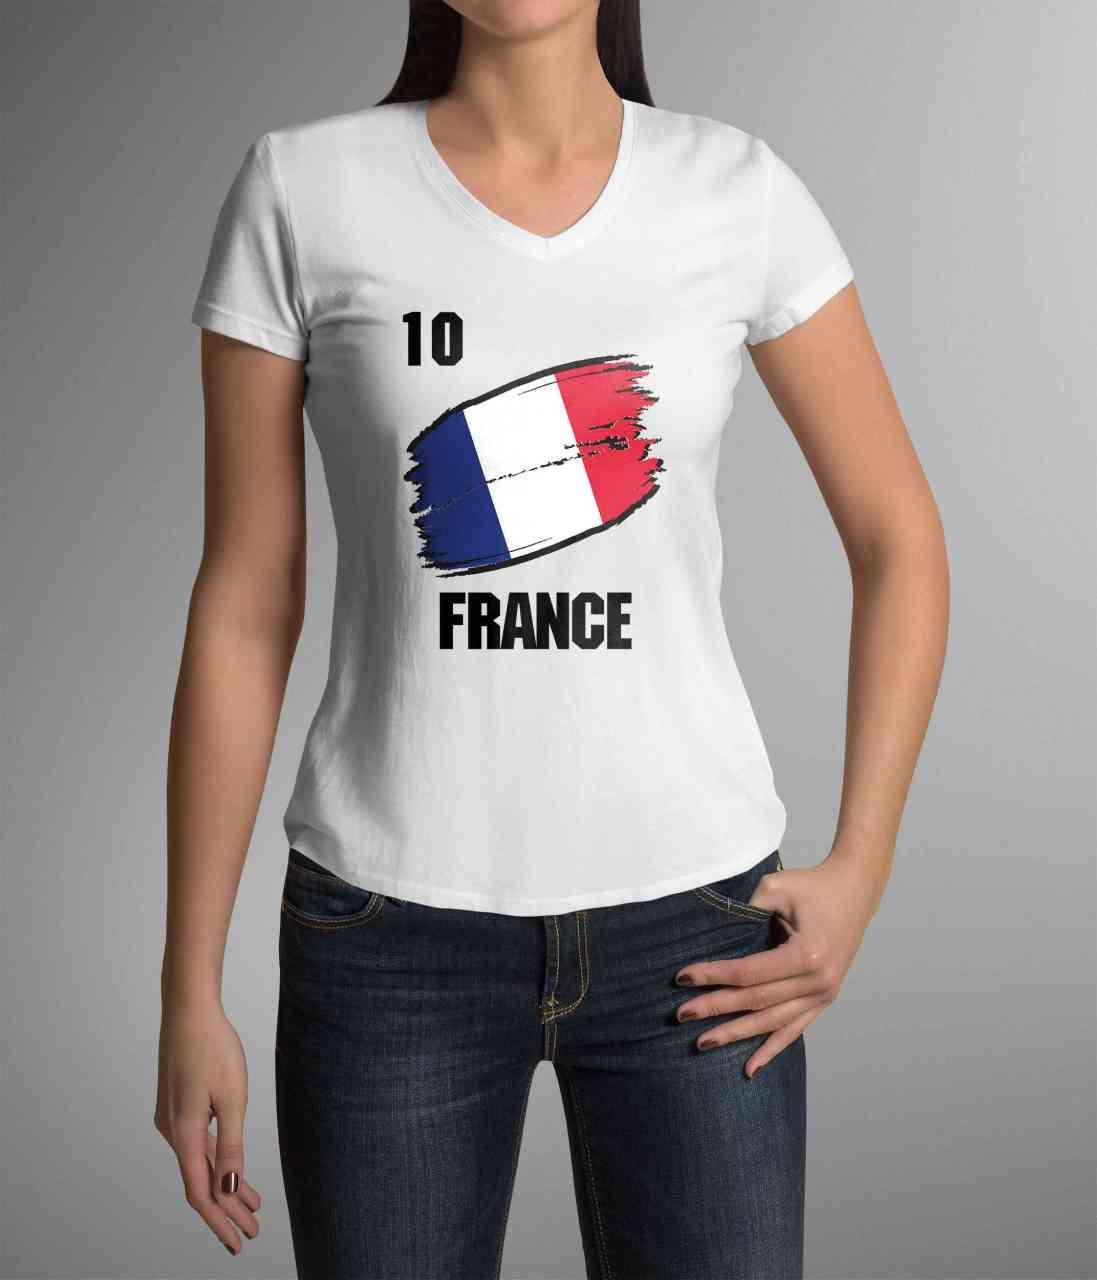 France | Frankreich | Männer oder Frauen Trikot T - Shirt mit Wunsch Nummer + Wunsch Name | WM 2018